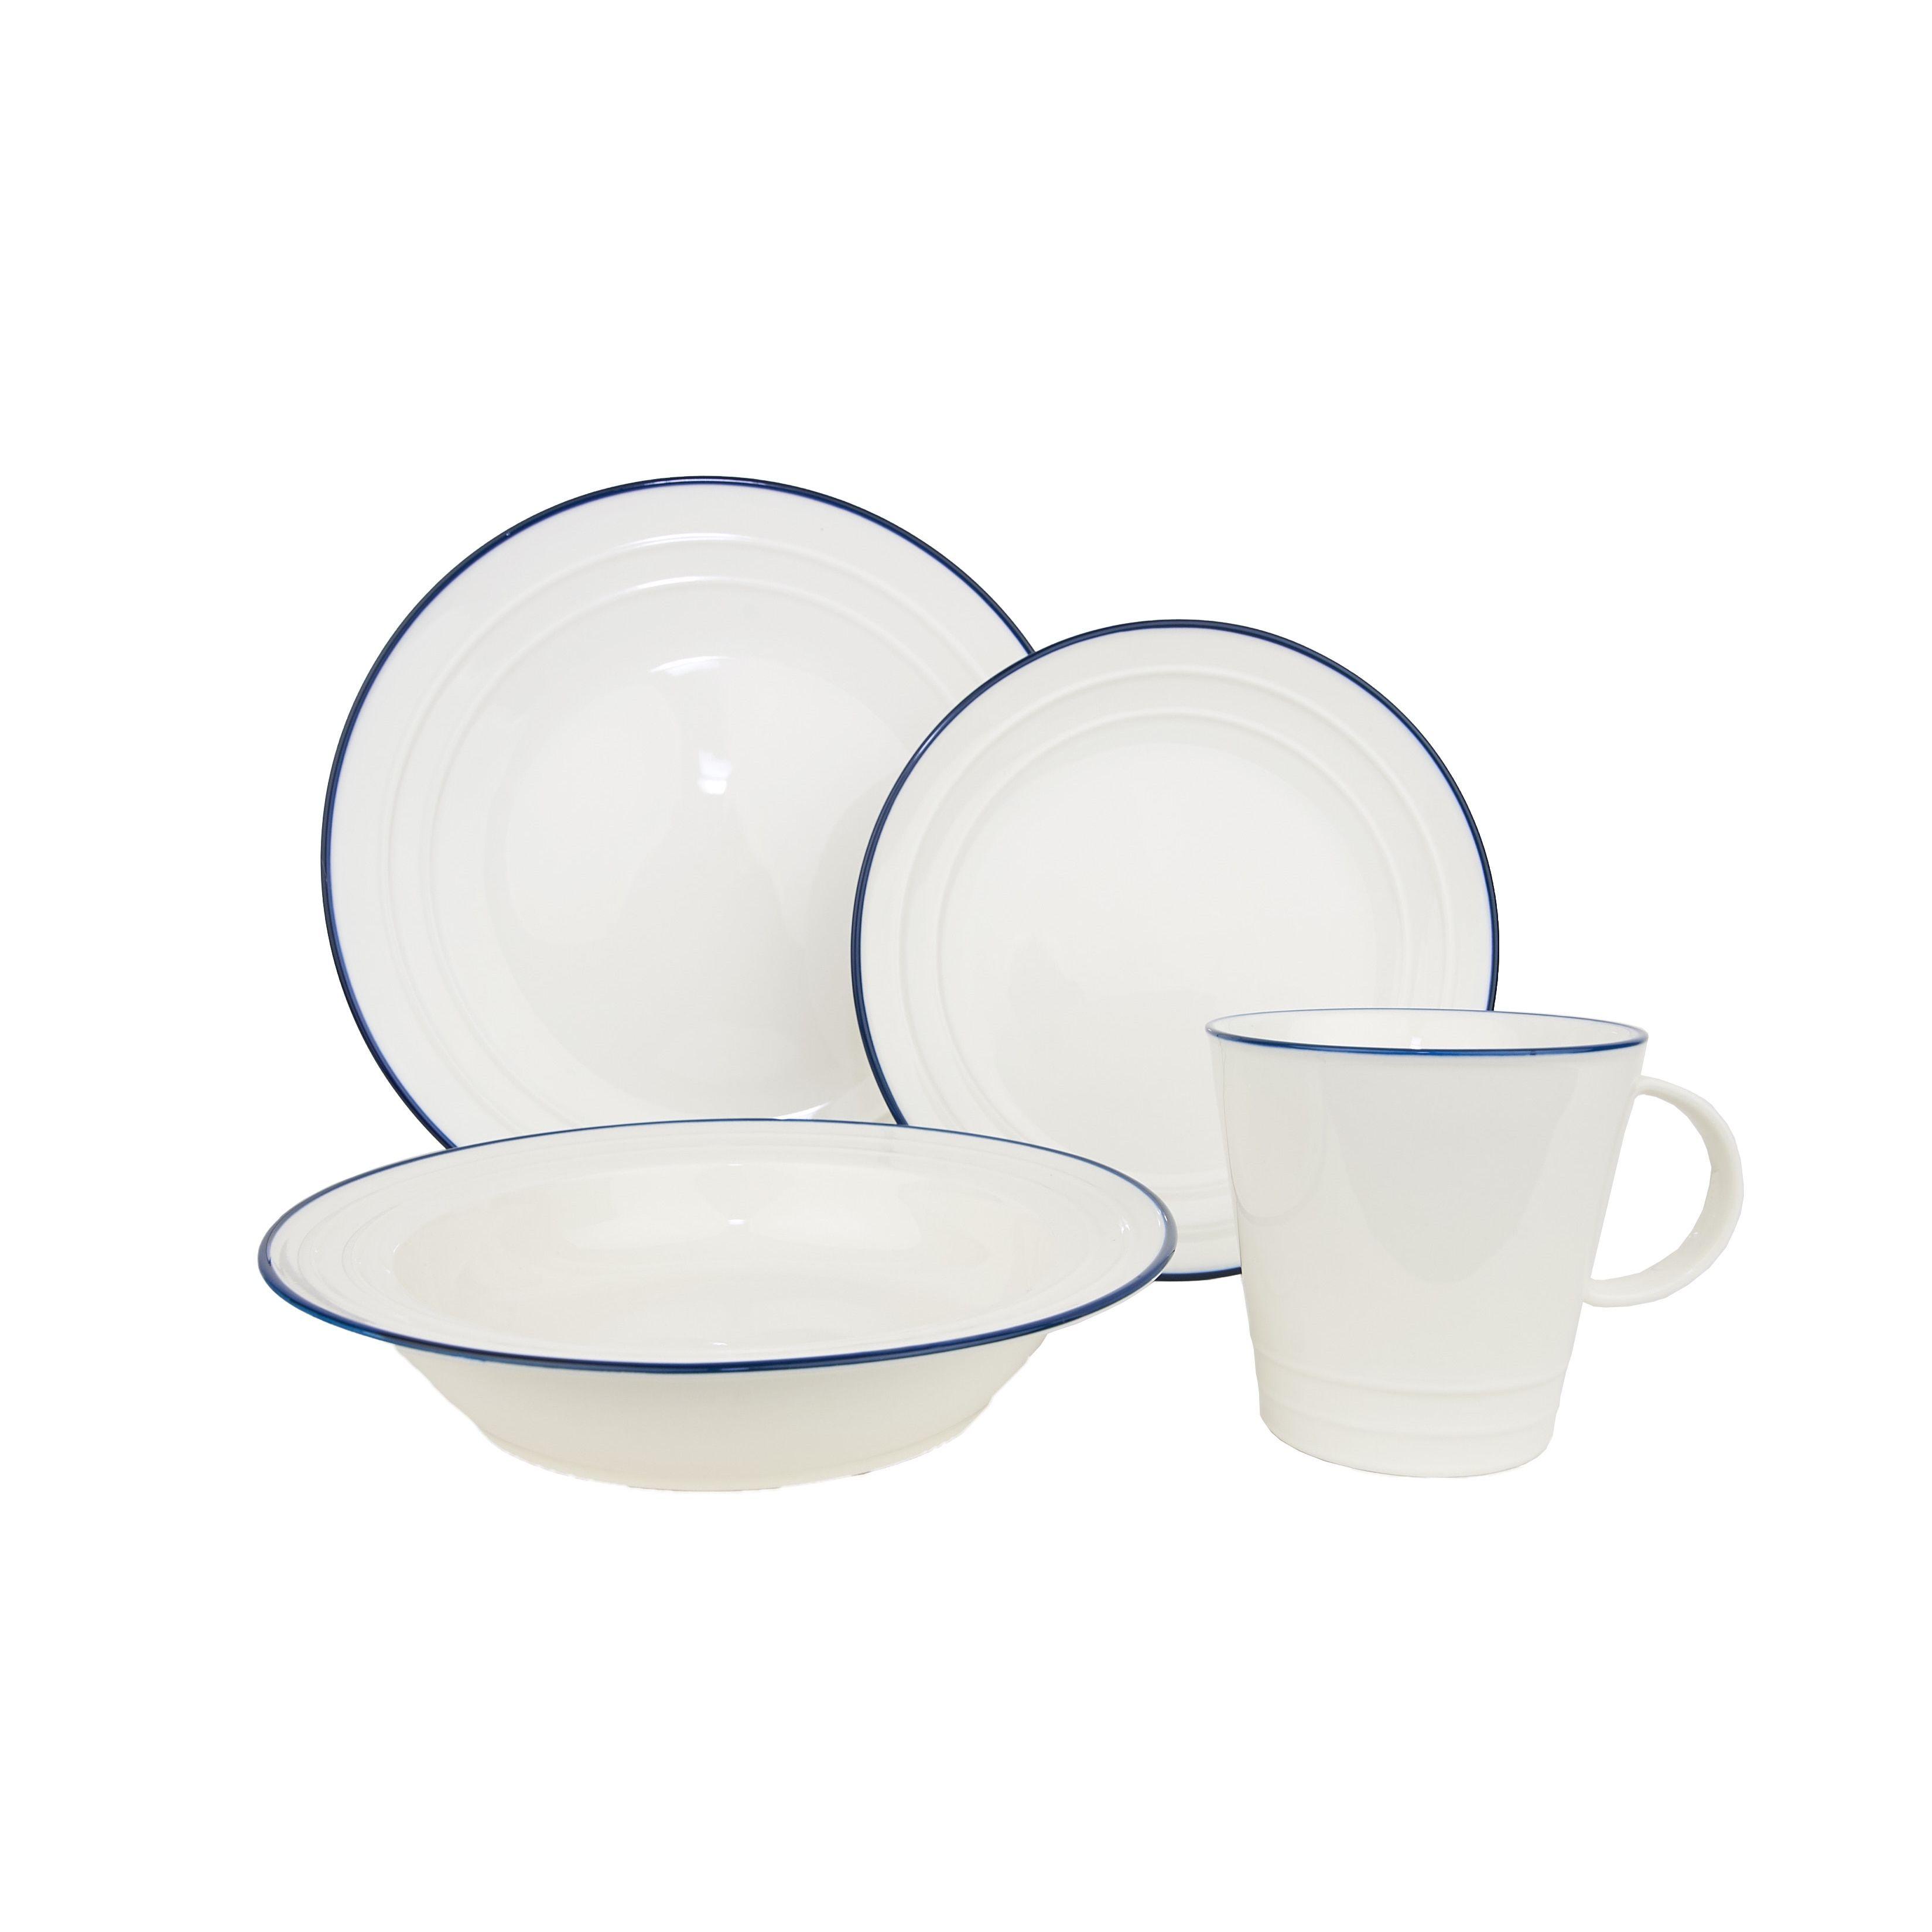 Baker S Blue 16 Piece Dinnerware Set Service For 4 Baker S Blue